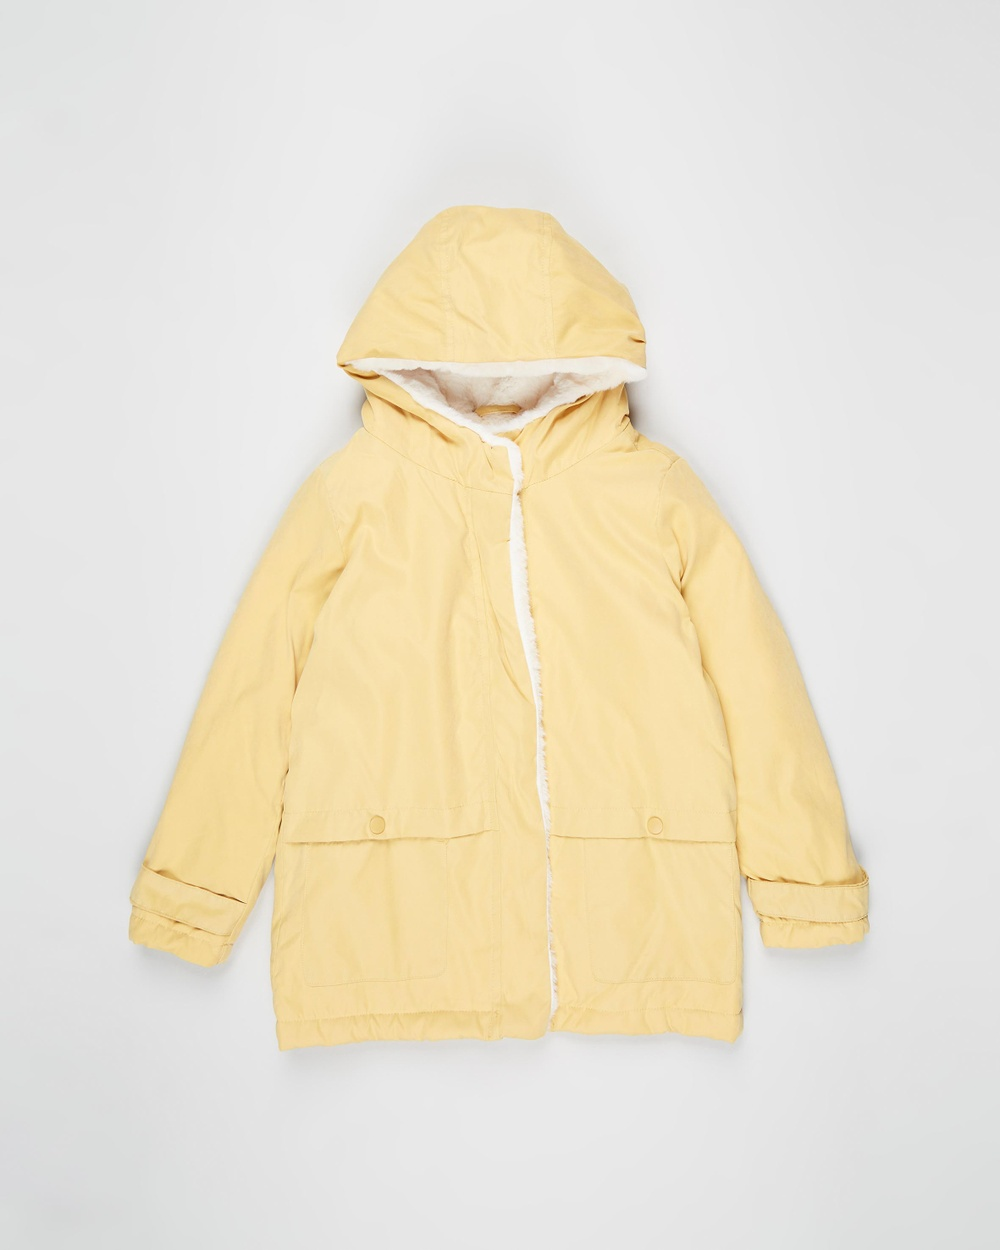 Cotton On Kids Florence Parker Jacket Teens Coats & Jackets Honey Gold Kids-Teens